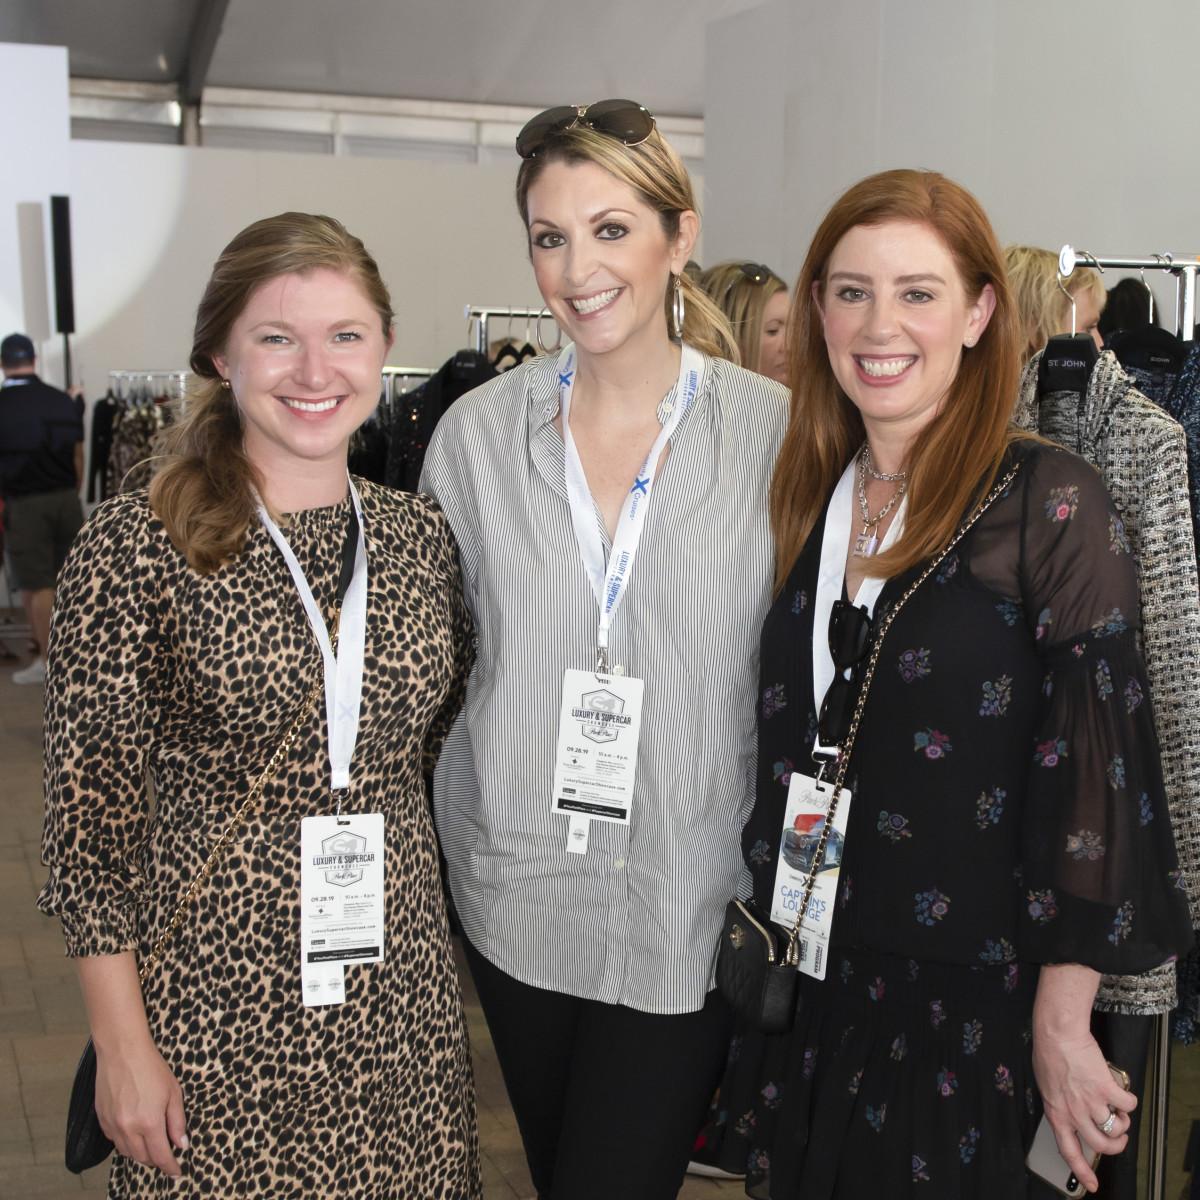 Hendrika Diehl, Victoria Snee, Liz Thrash